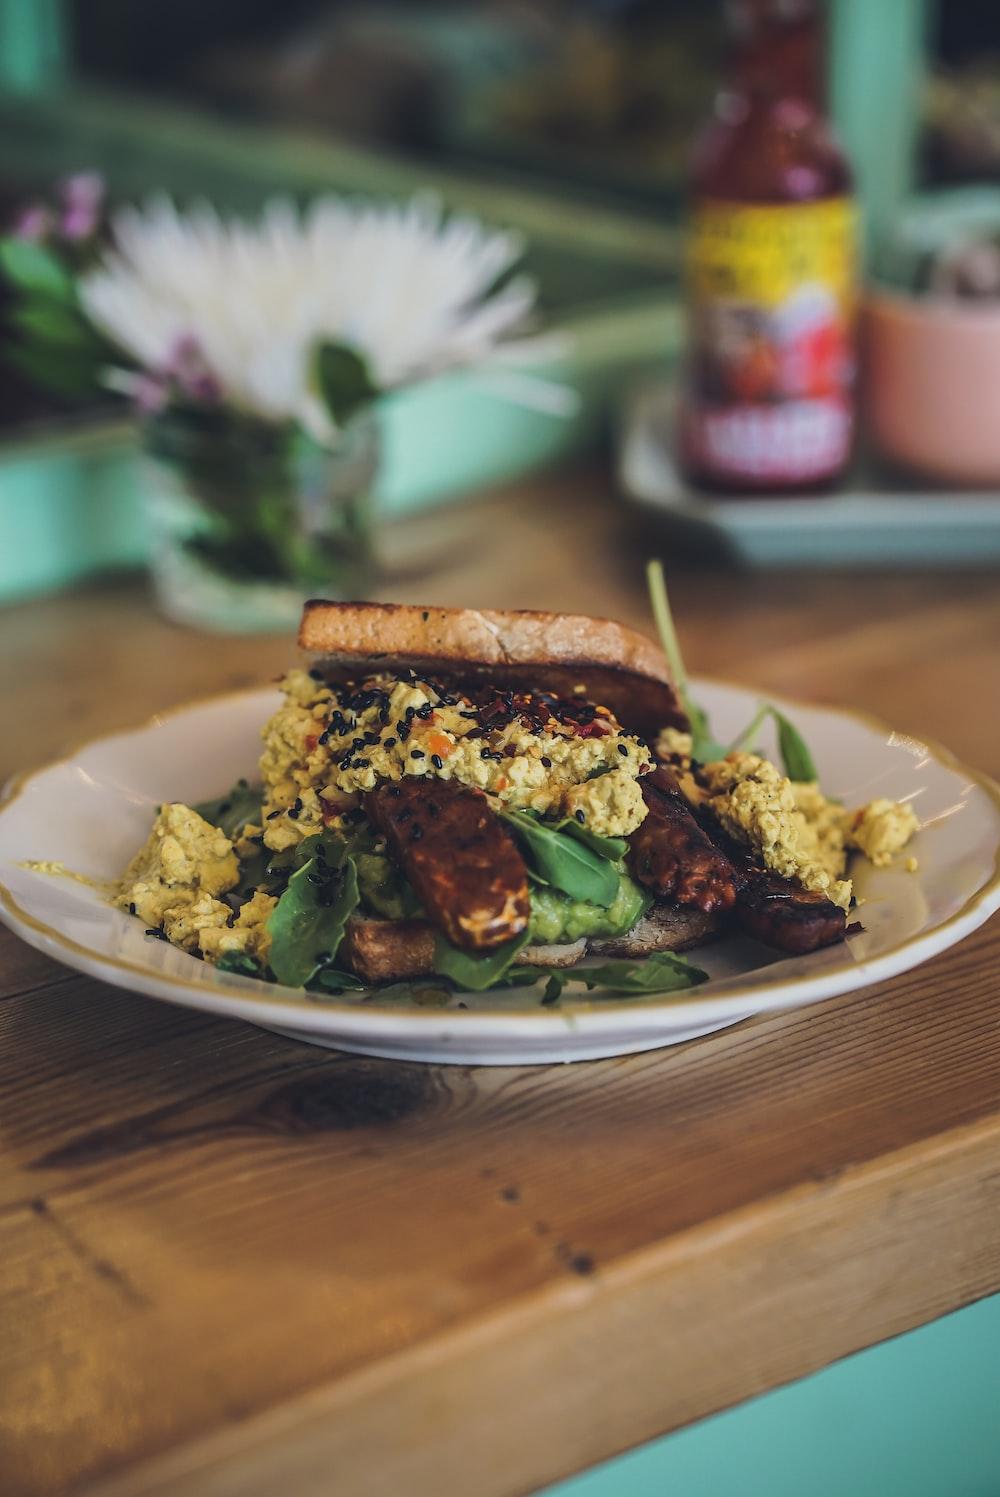 egg sandwich on plate